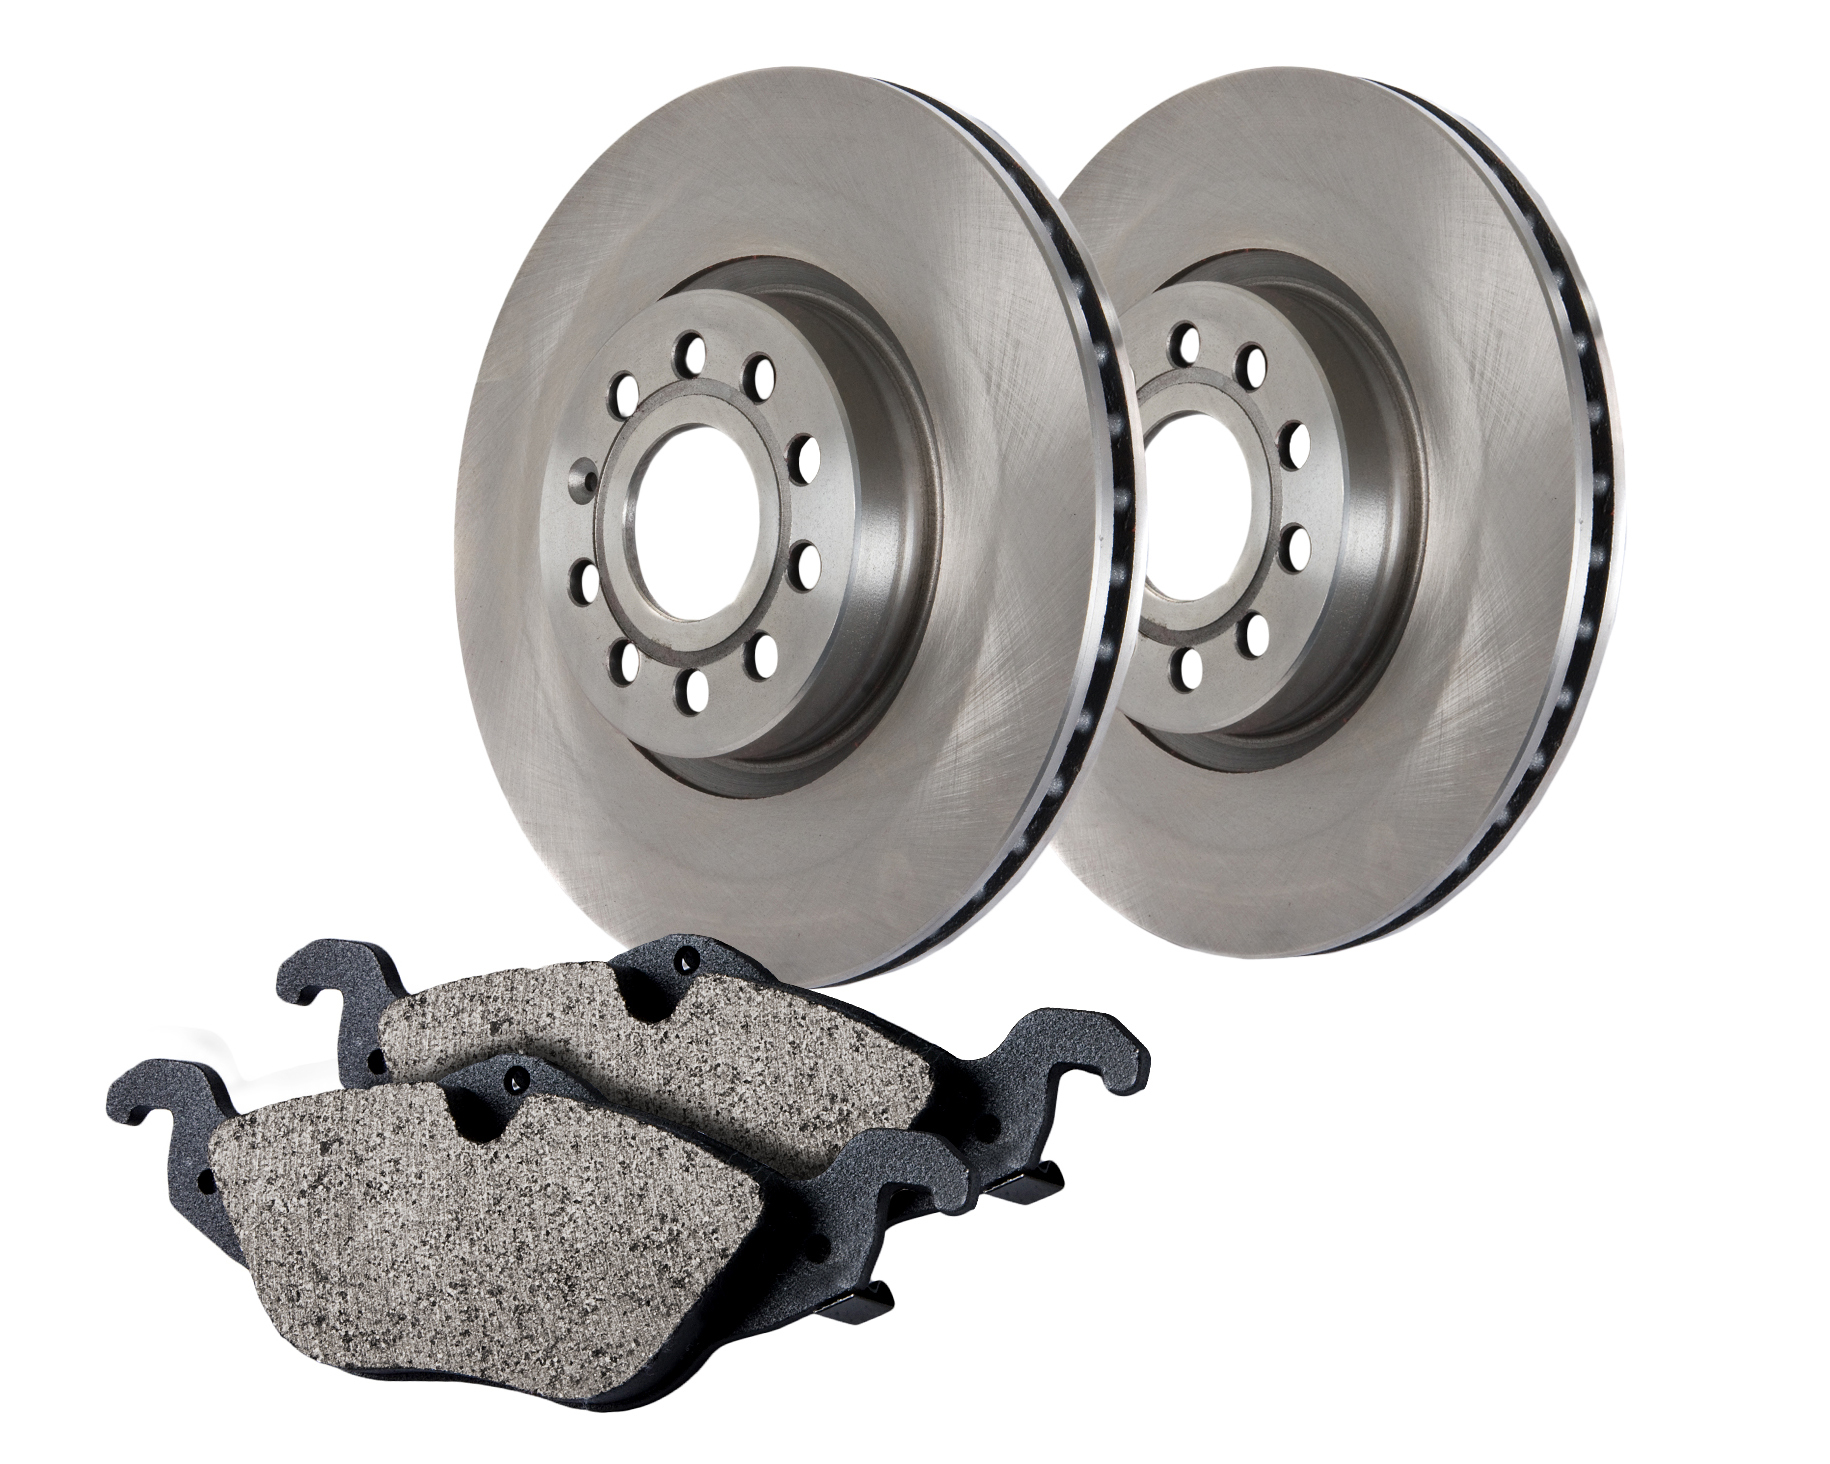 Centric Brake Parts 905.61057 Brake Rotor and Pad Kit, Premium, Semi-Metallic Pads, Iron, Natural, Ford Fullsize Car 1998-2002, Kit